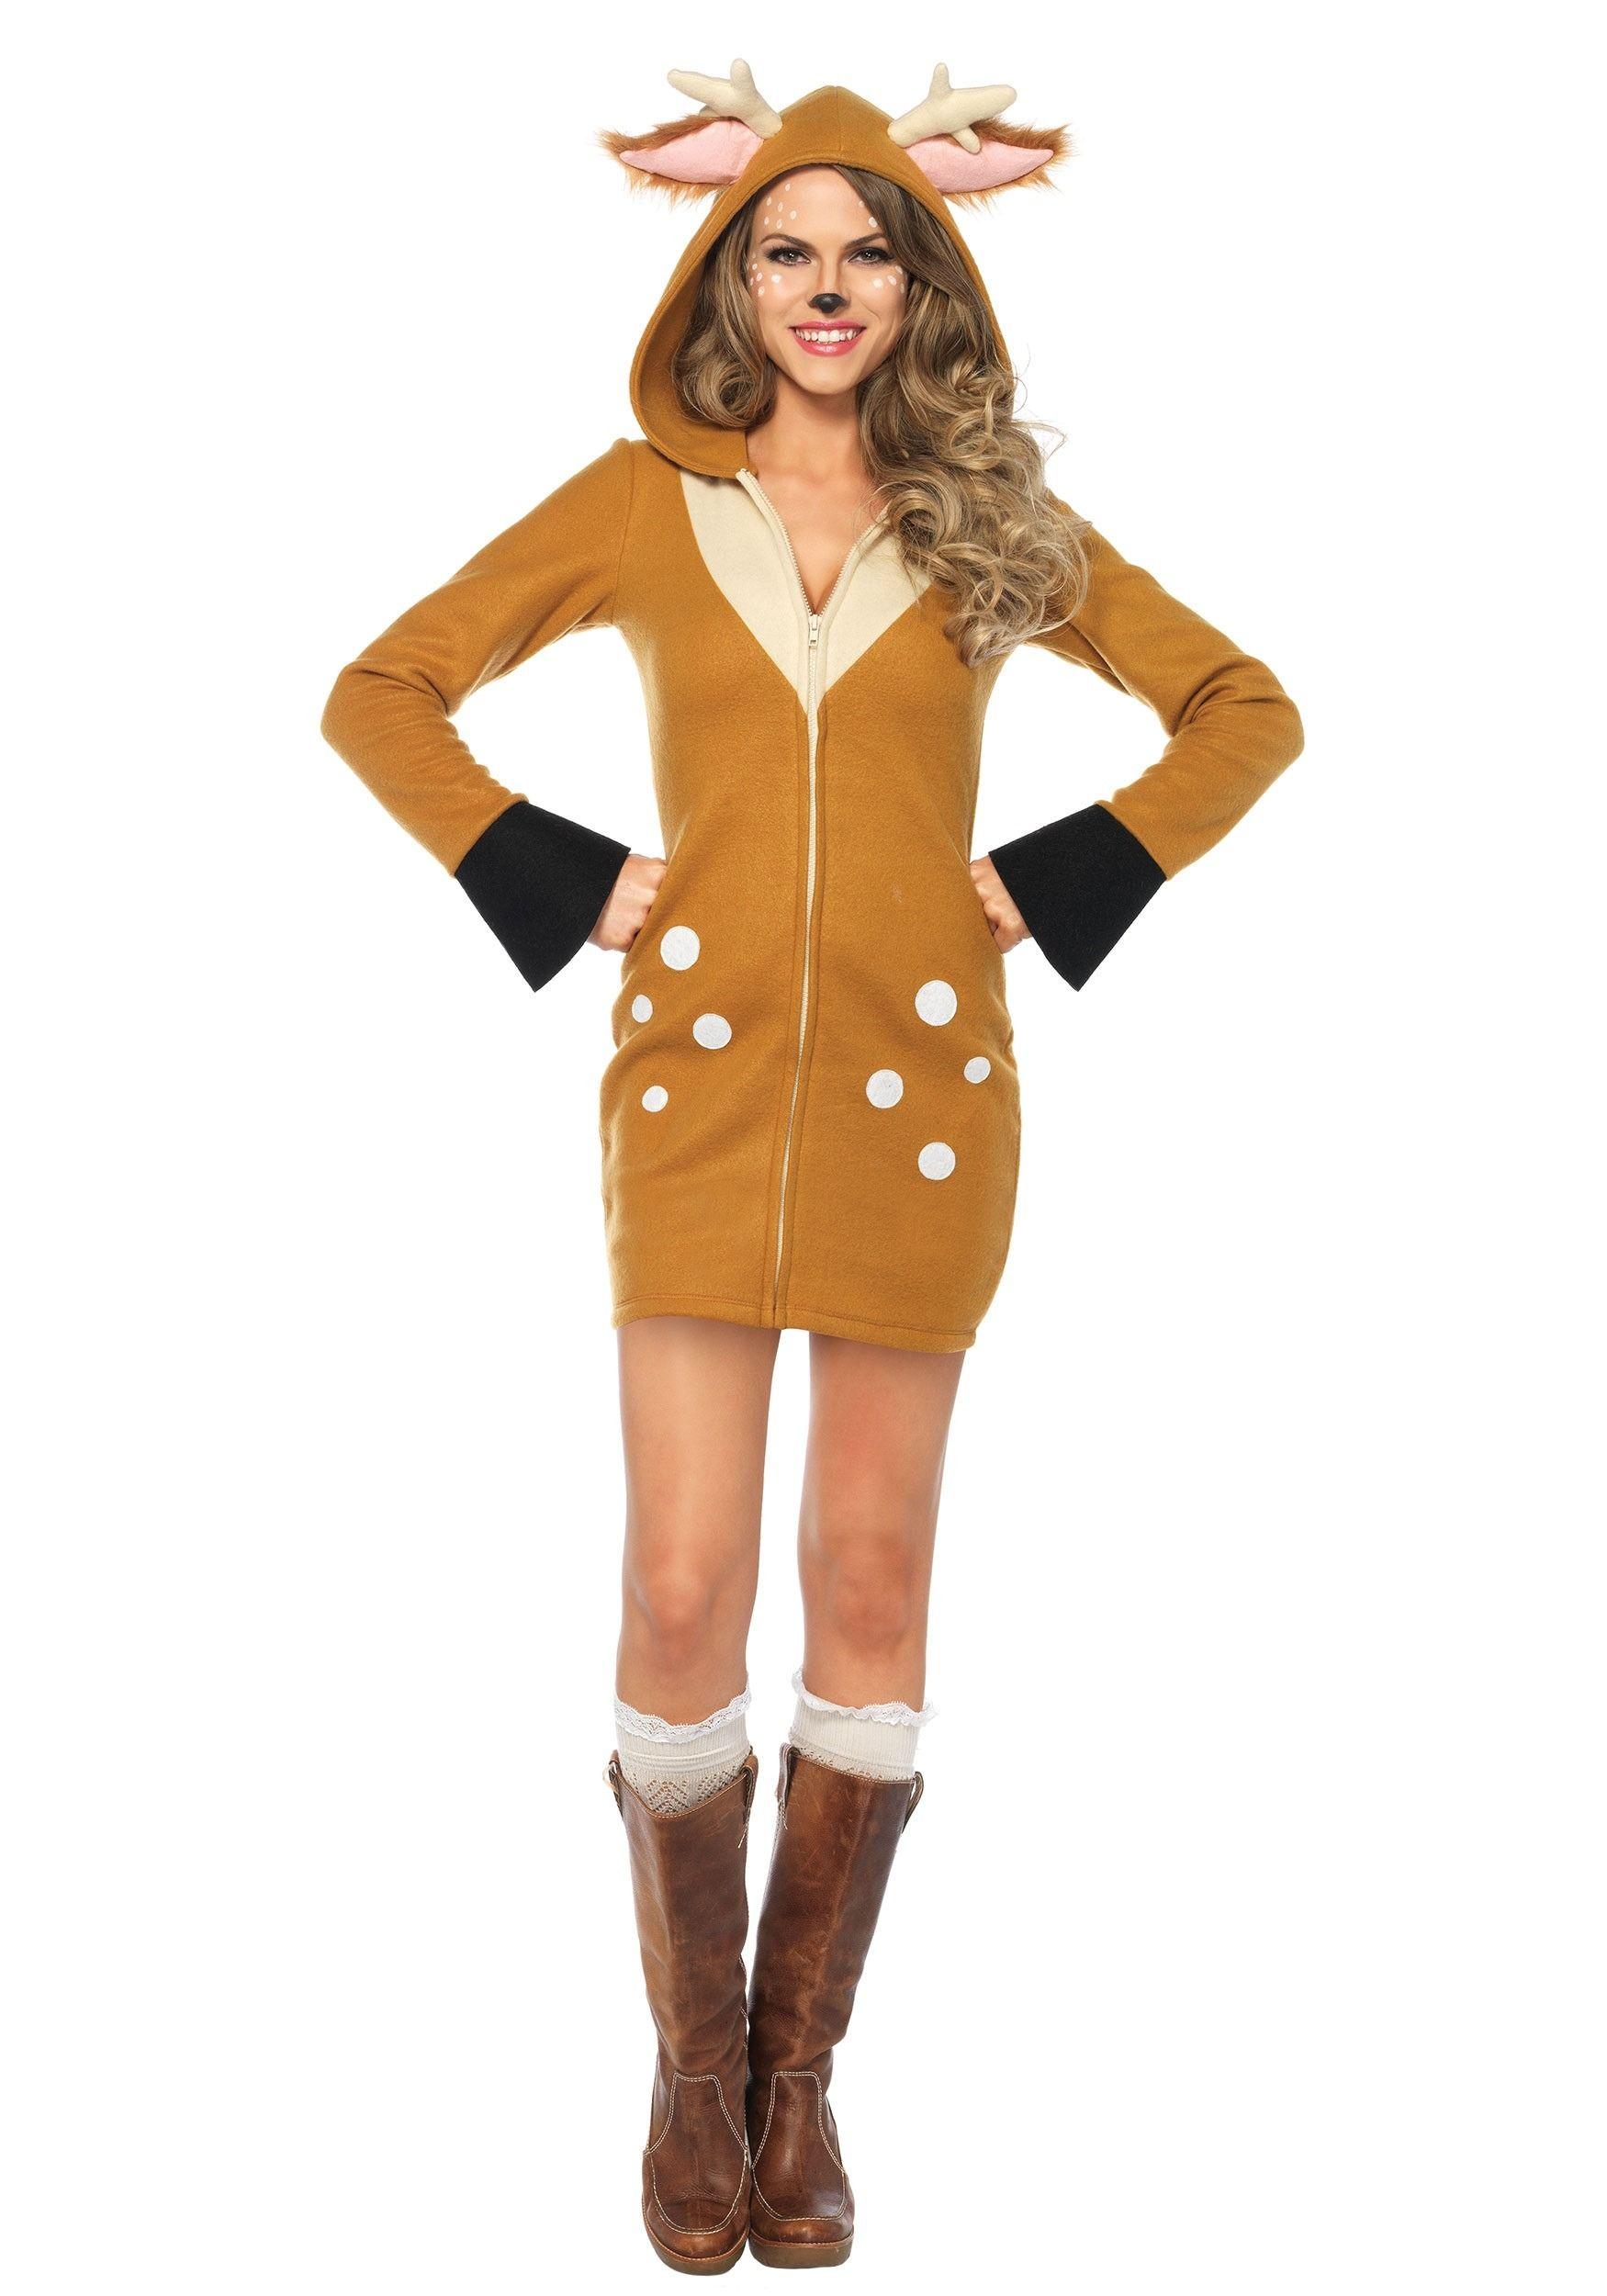 Womens cozy fawn costume halloween costume ideas pinterest womens cozy fawn costume solutioingenieria Choice Image